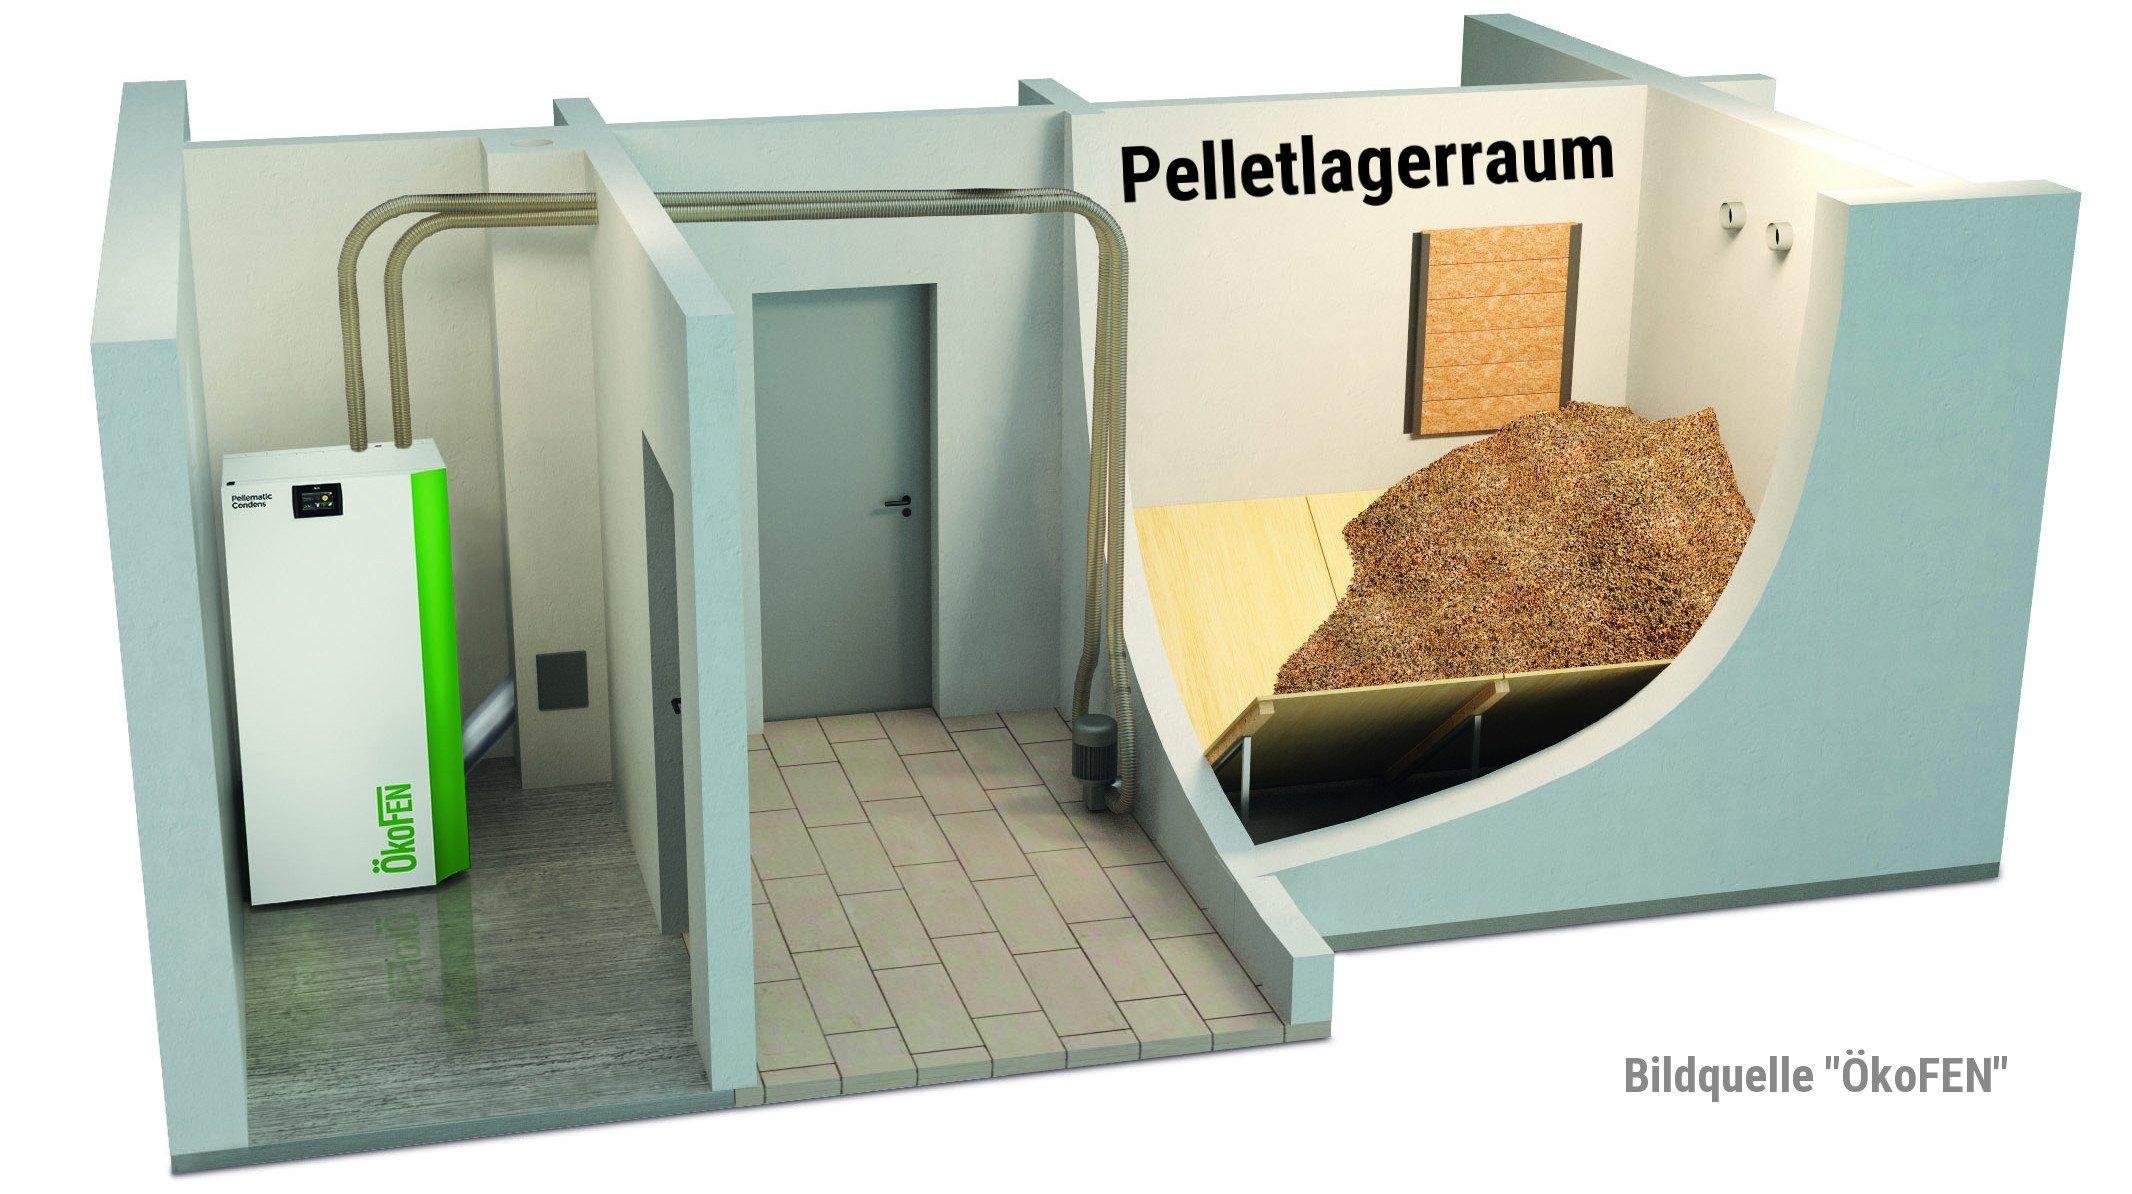 Pelletlagerraum